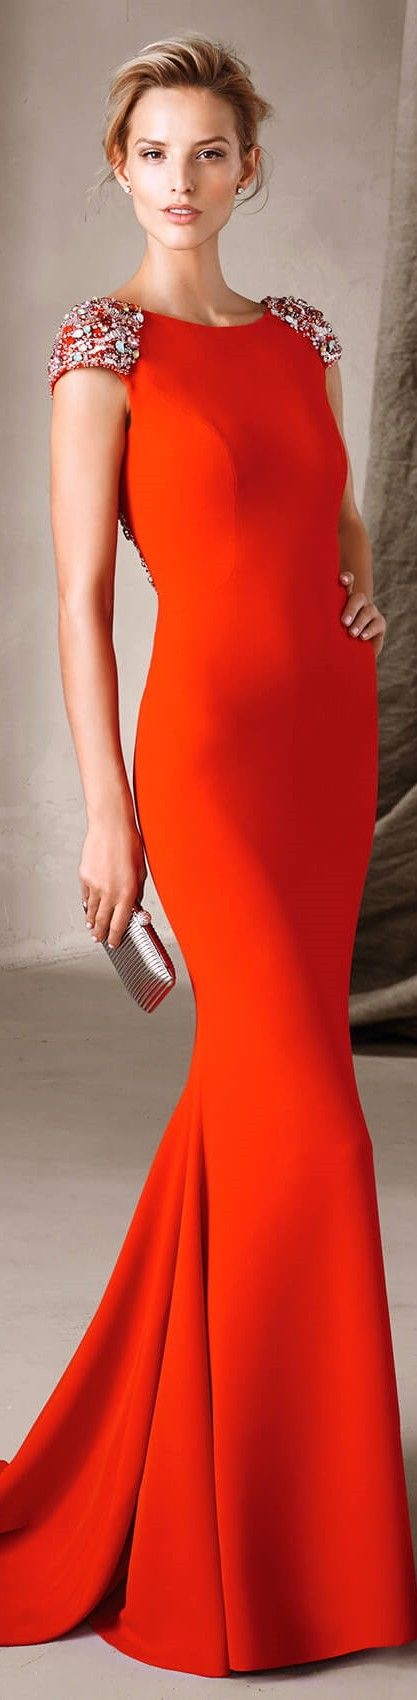 Pronovias 2017 orange dress women fashion outfit clothing style apparel @roressclothes closet ideas